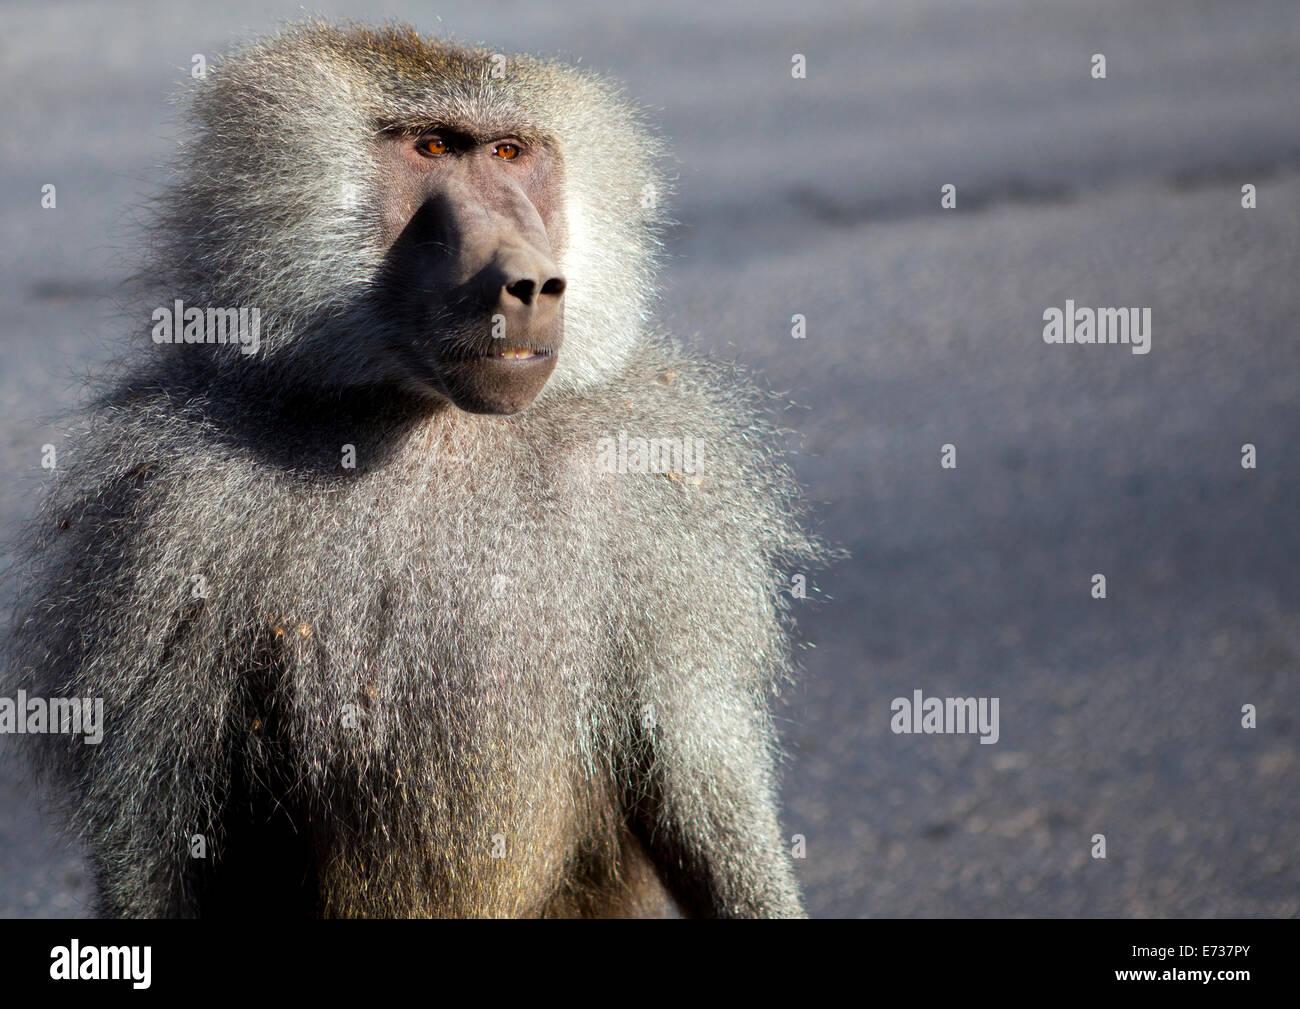 Male Hamadryas Baboon, Dire Dawa, Ethiopia - Stock Image